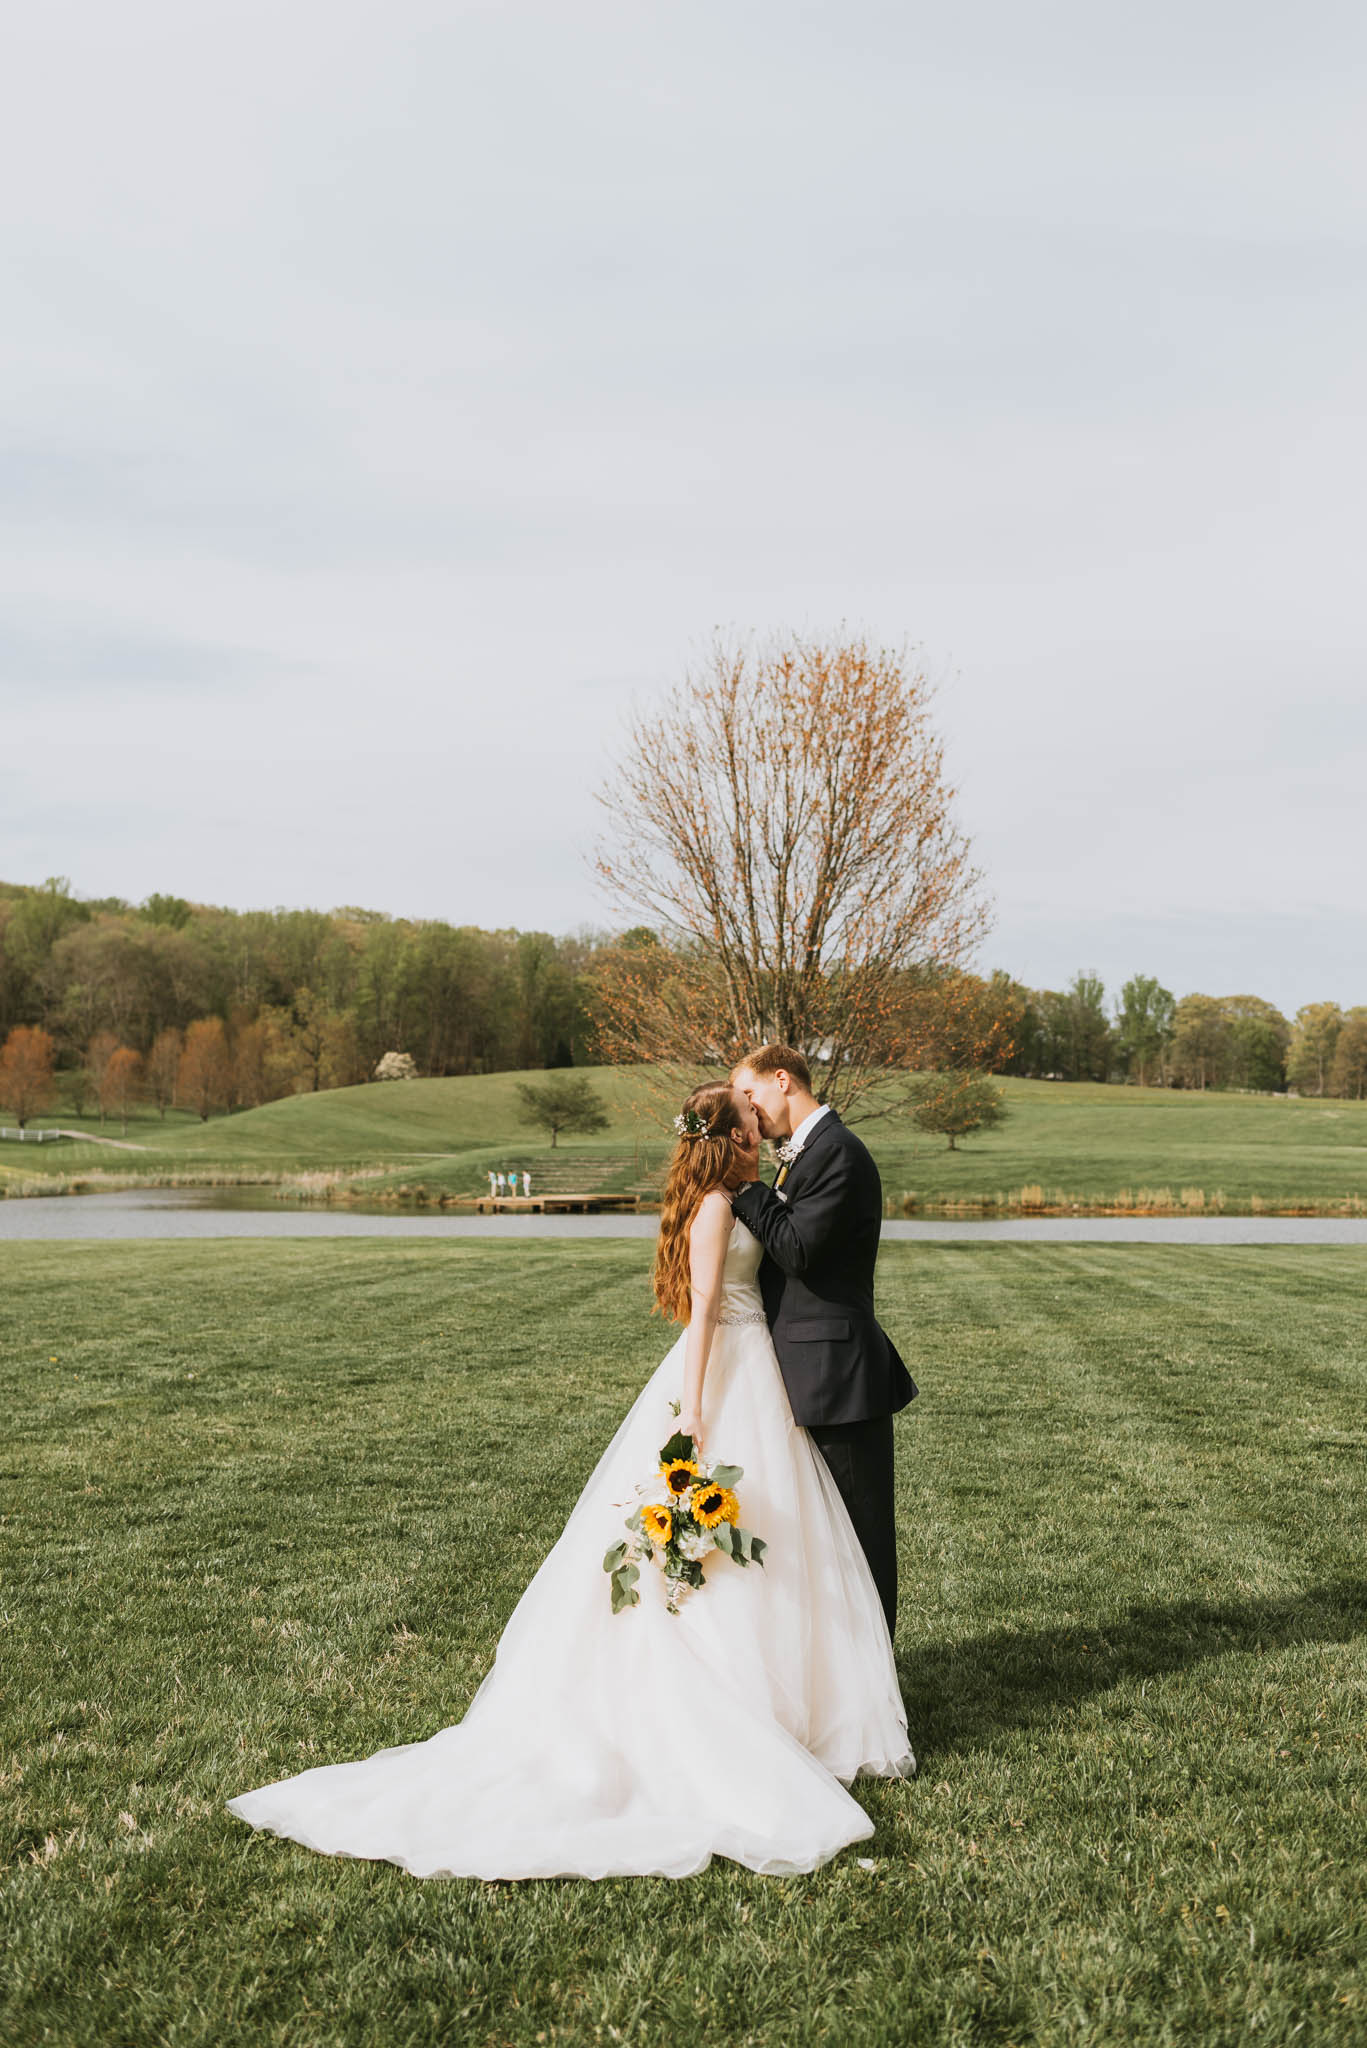 Grace Meadows Farm Wedding, Jonesborough, TN, Northeast Tennessee Wedding Photographer, East Tennessee Wedding Photographer, Knoxville, TN Wedding Photographer